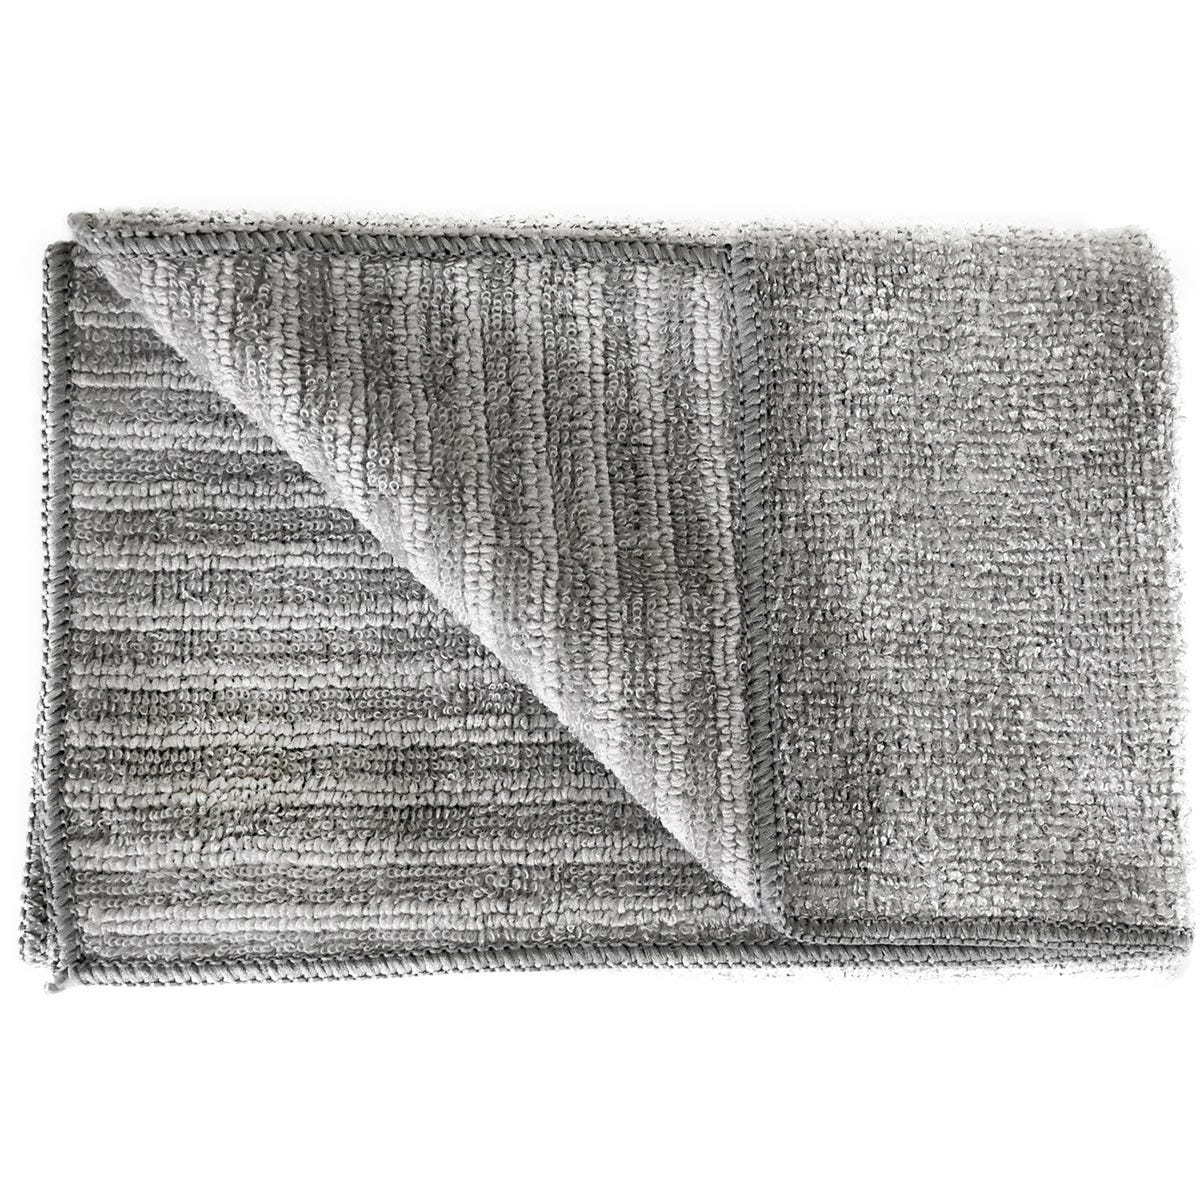 https://googone.com/media/catalog/product/w/e/weiman-microfiber-cloth-for-stainless-steel_fold_4.jpg